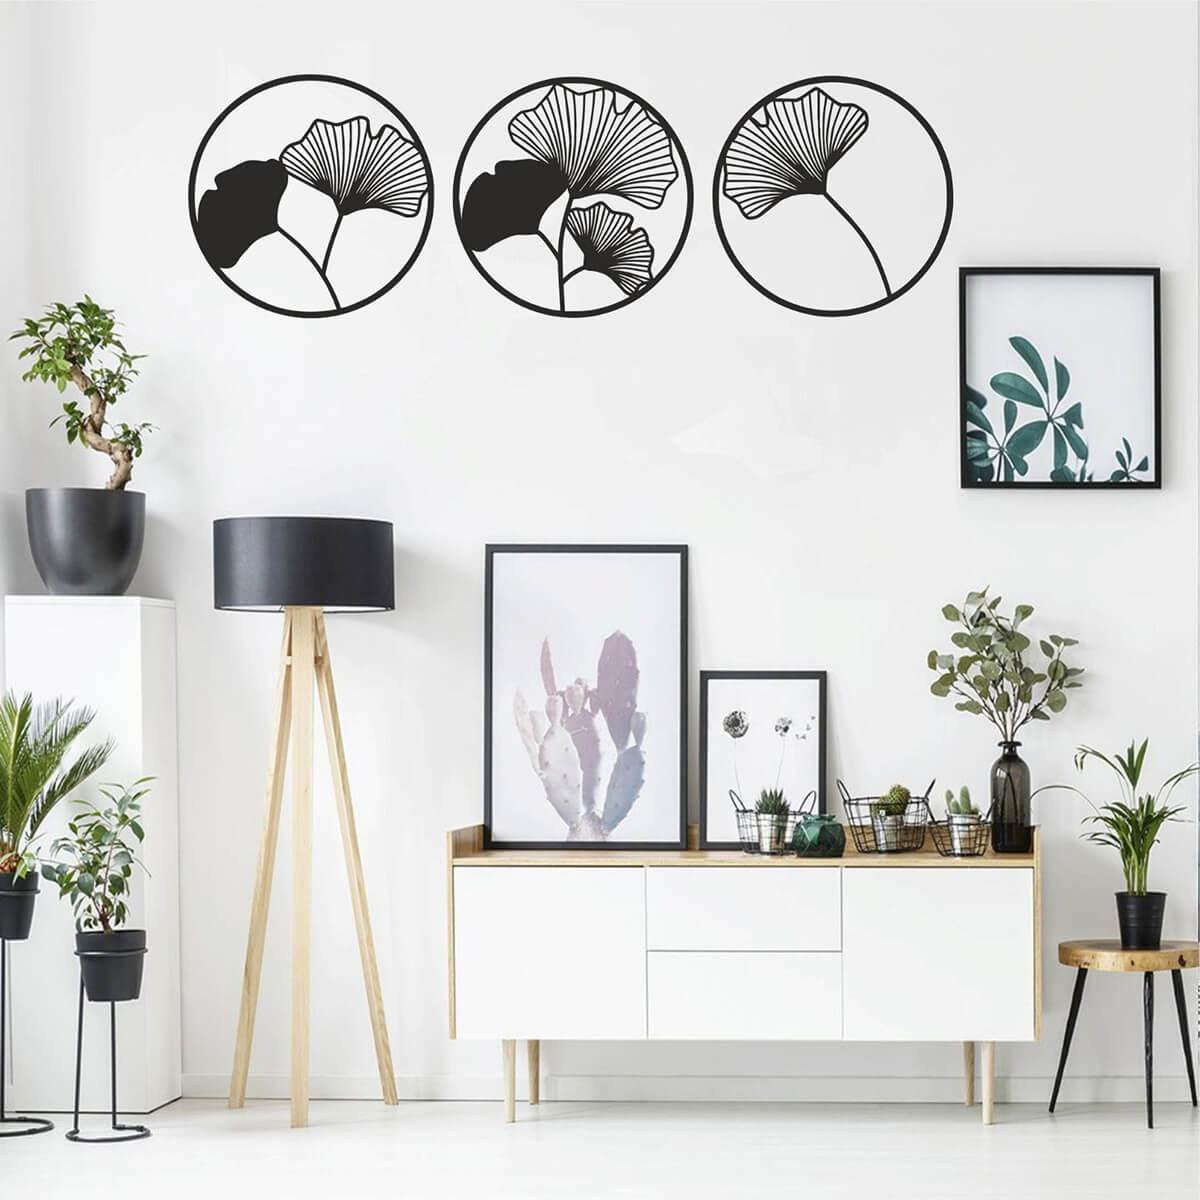 чёрно-белые идеи домашнего декора фото 2